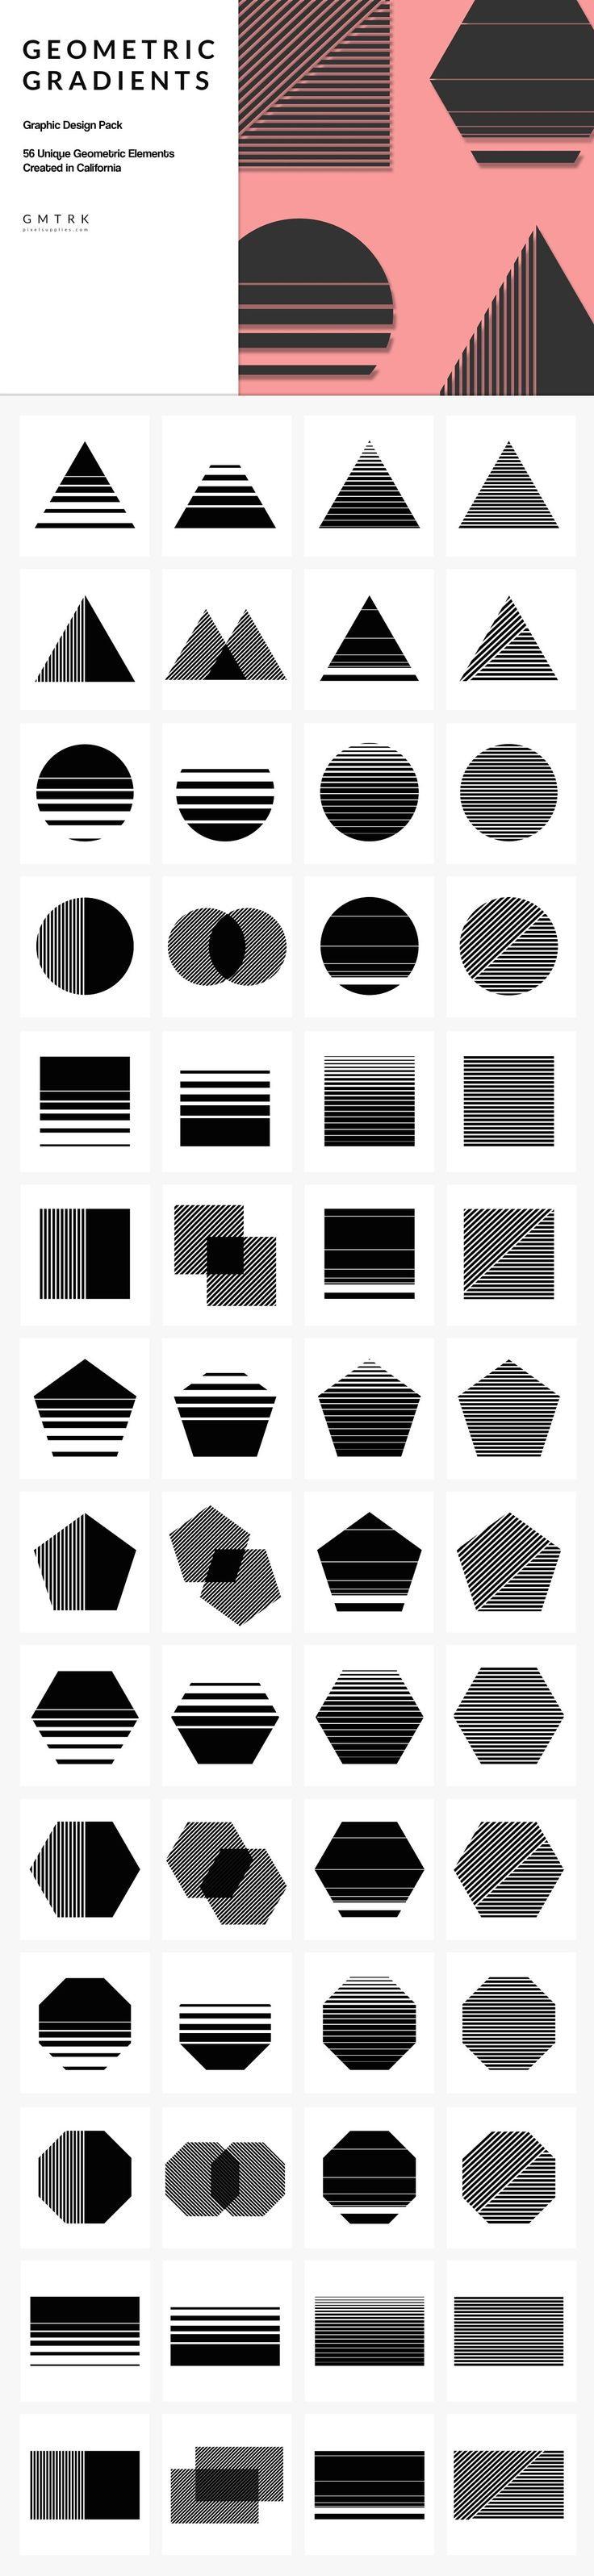 Geometric Gradient Design Kit geometric geometry vector icons shapes graphics illustrator photoshop psd ai graphic branding logo minimal minimalist